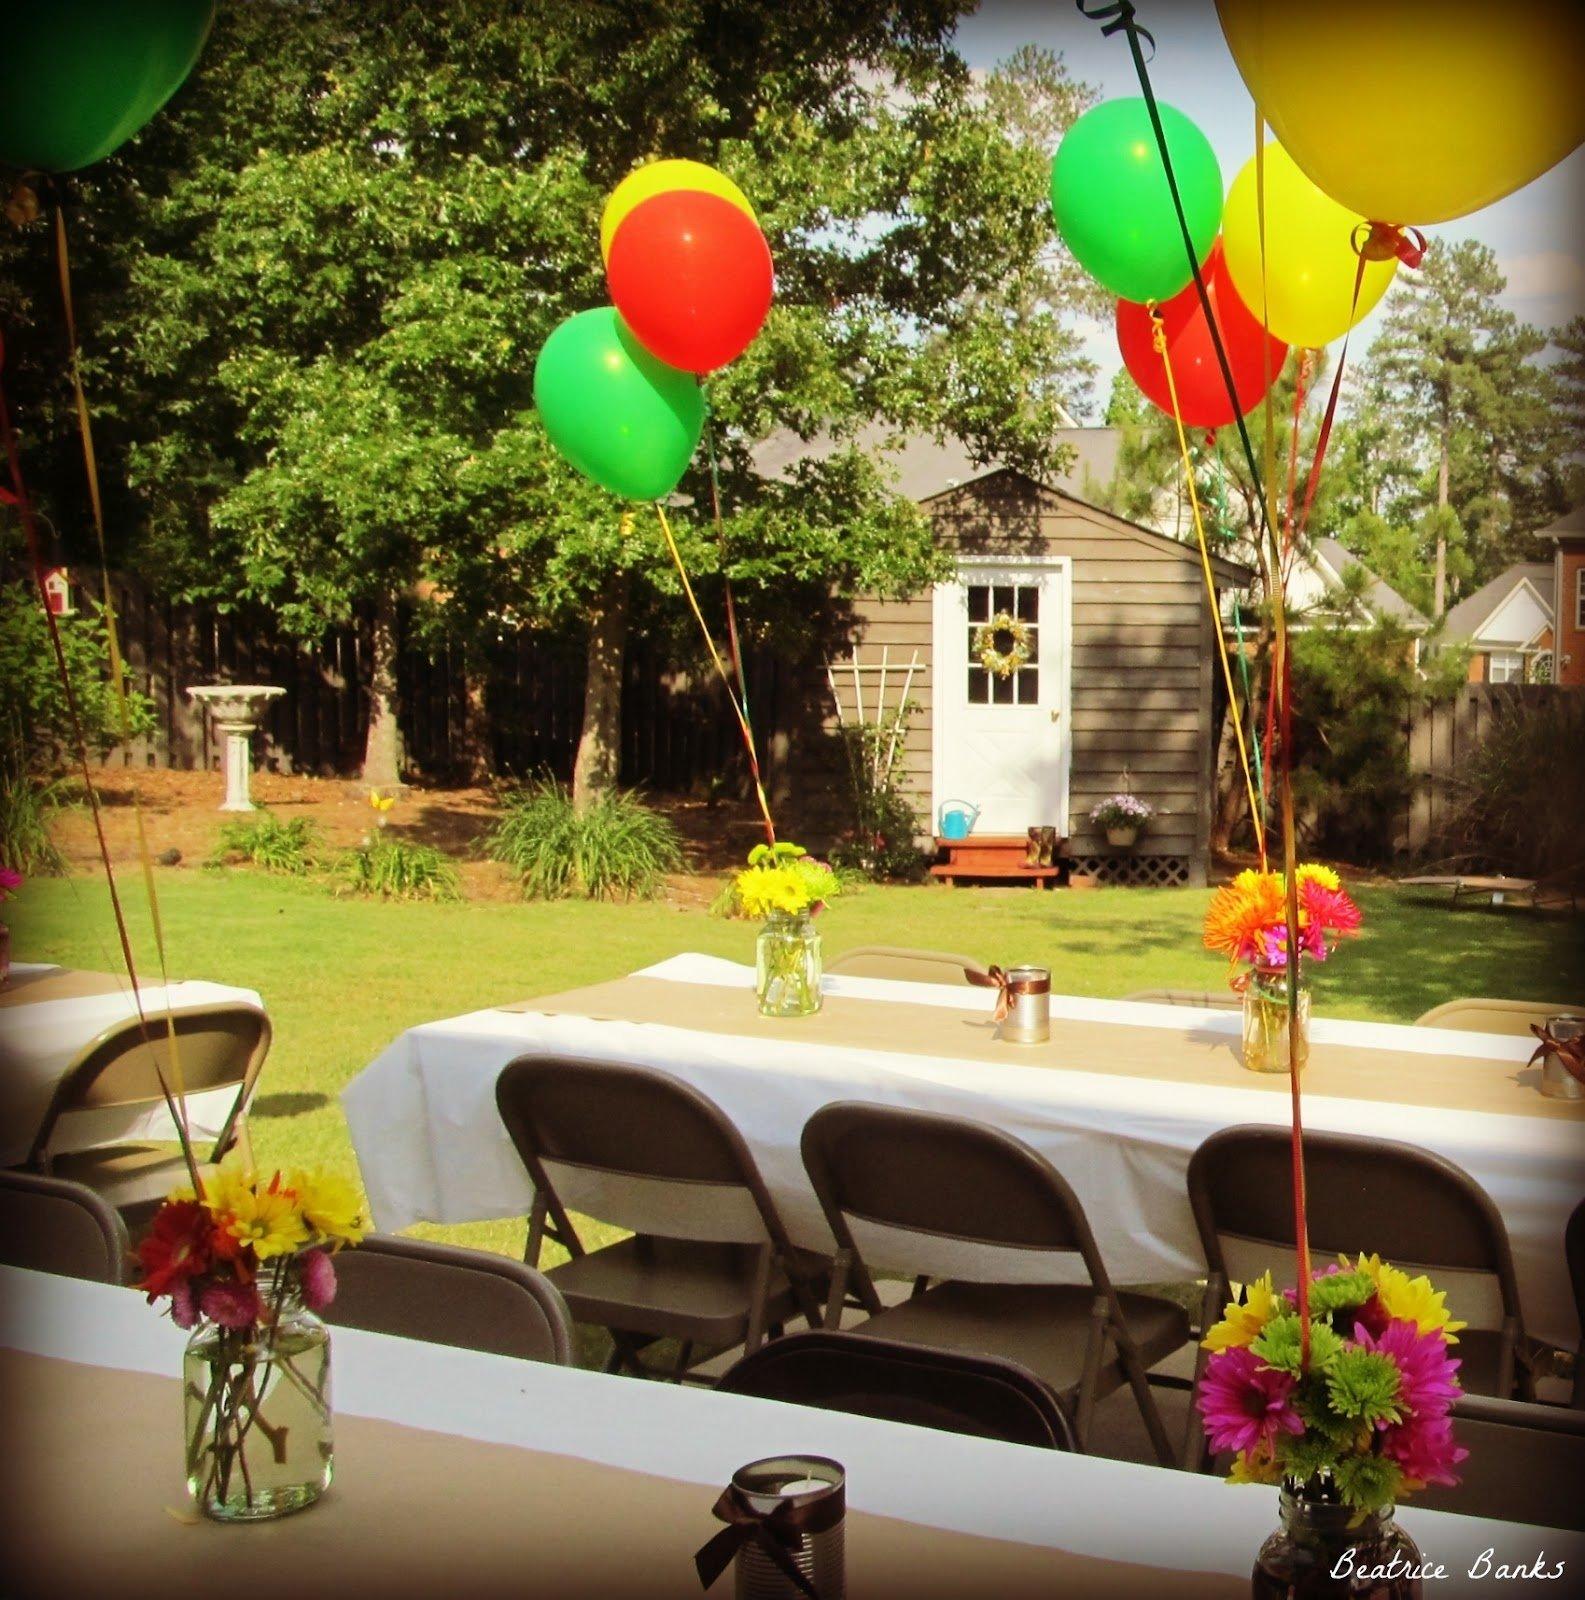 10 Lovable High School Graduation Open House Ideas backyard graduation party beatrice banks party time pinterest 1 2021